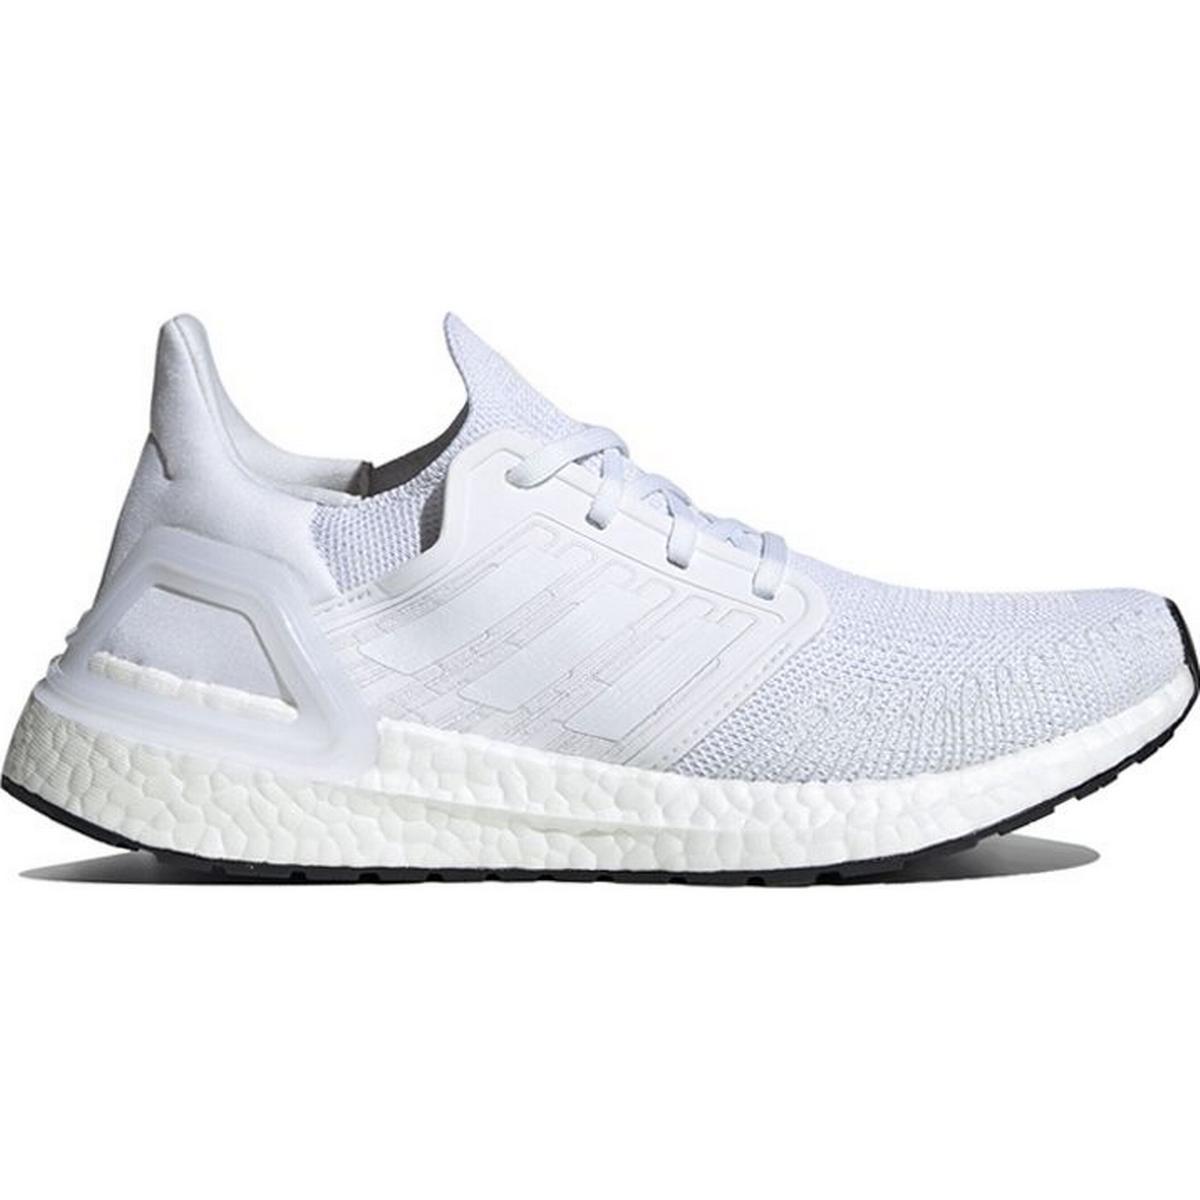 Adidas UltraBOOST 20 W Core BlackNight MetallicCloud White